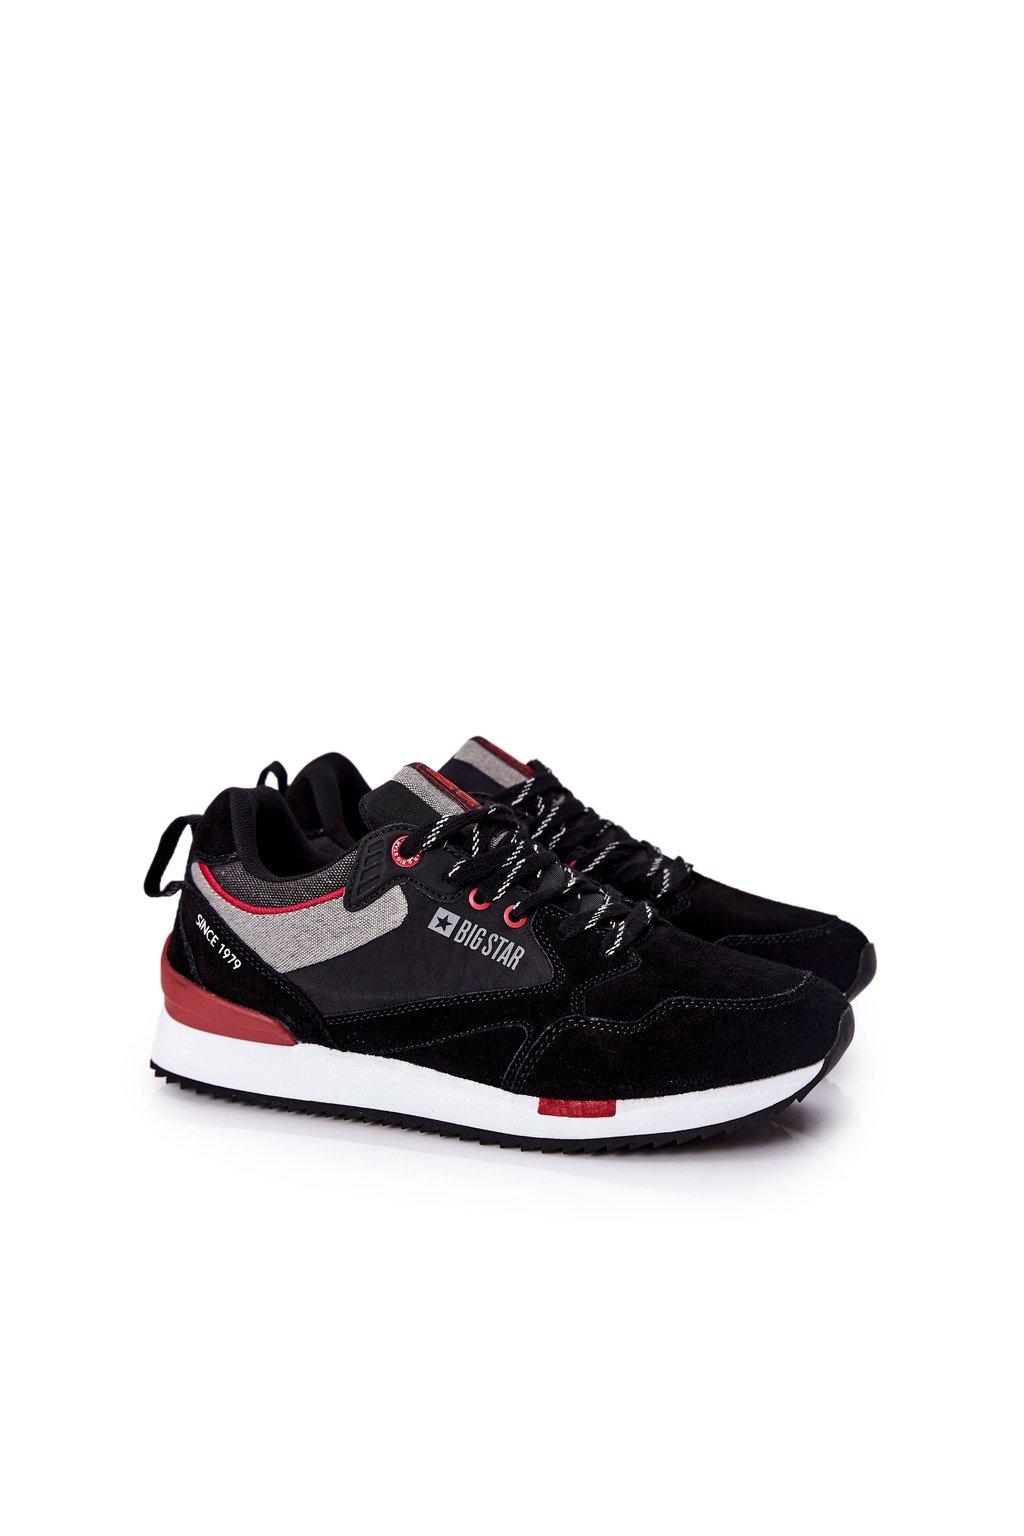 Čierna obuv kód topánok II174191 BLK